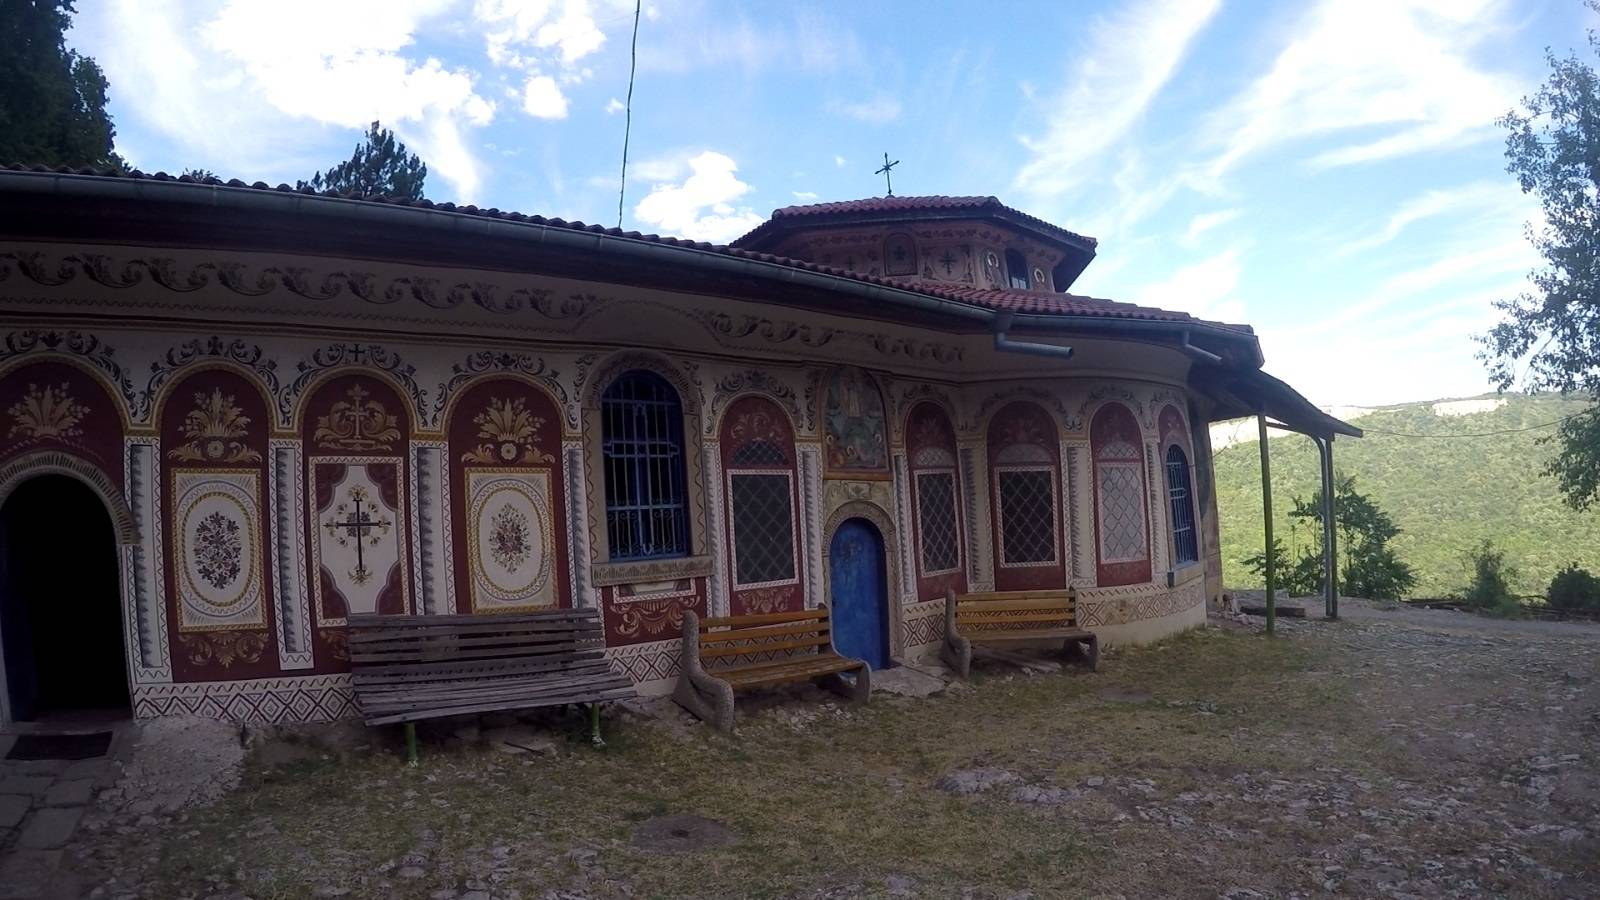 Photo 1: Veliko Tarnovo, ancienne capitale de la Bulgarie